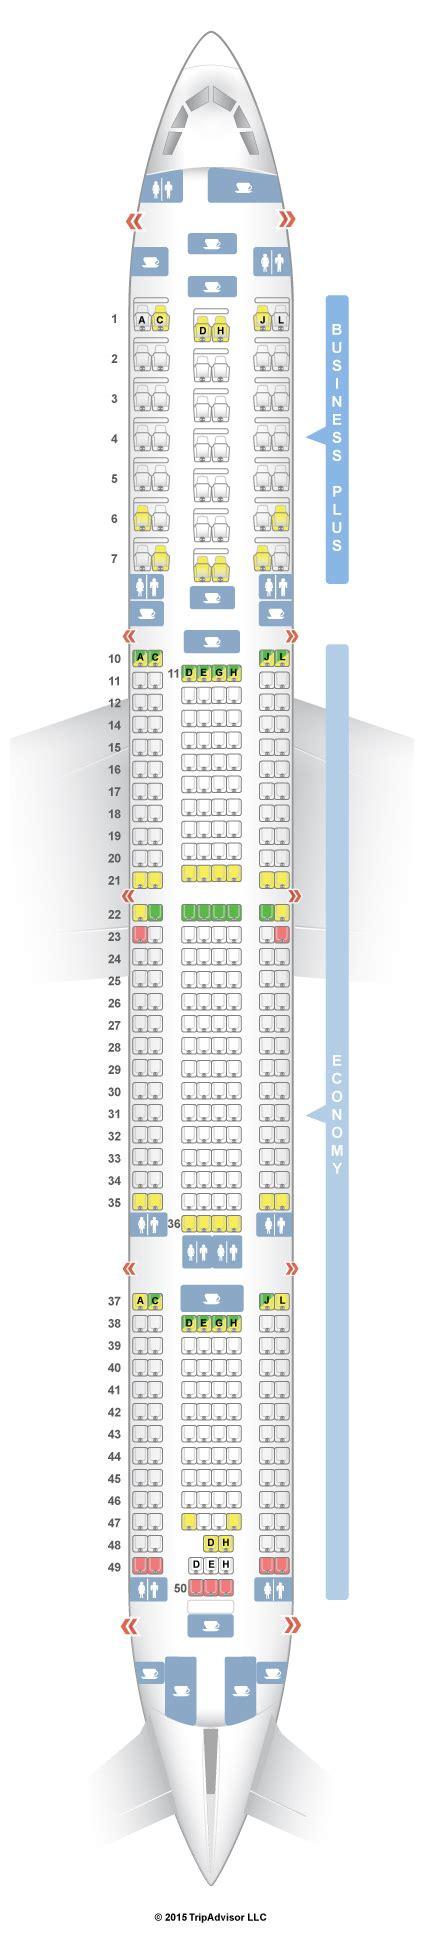 iberia airbus a340 500 seat map seatguru seat map iberia airbus a340 600 346